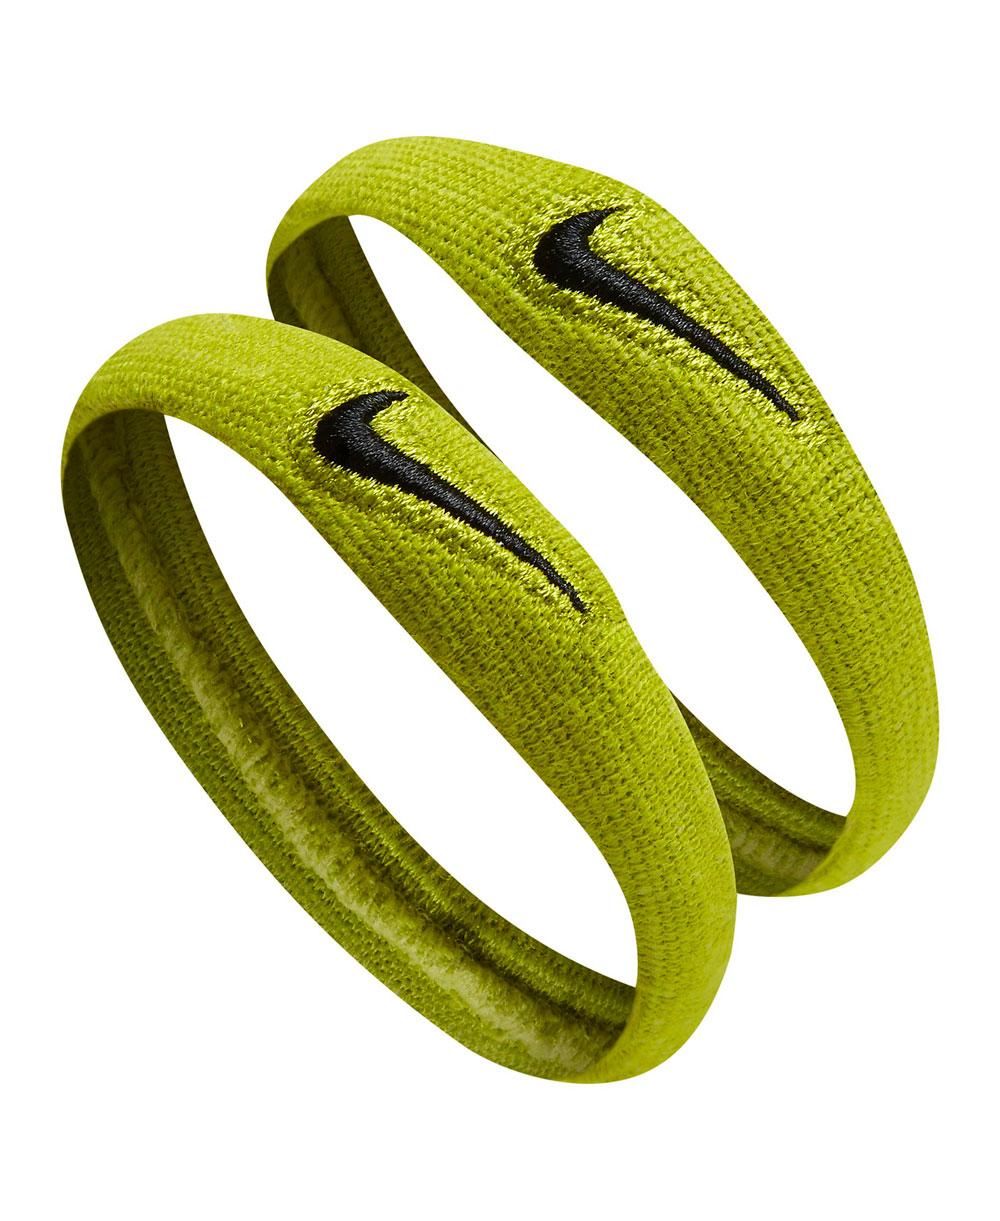 Dri-FIT Skinny Bandas para Biceps Green